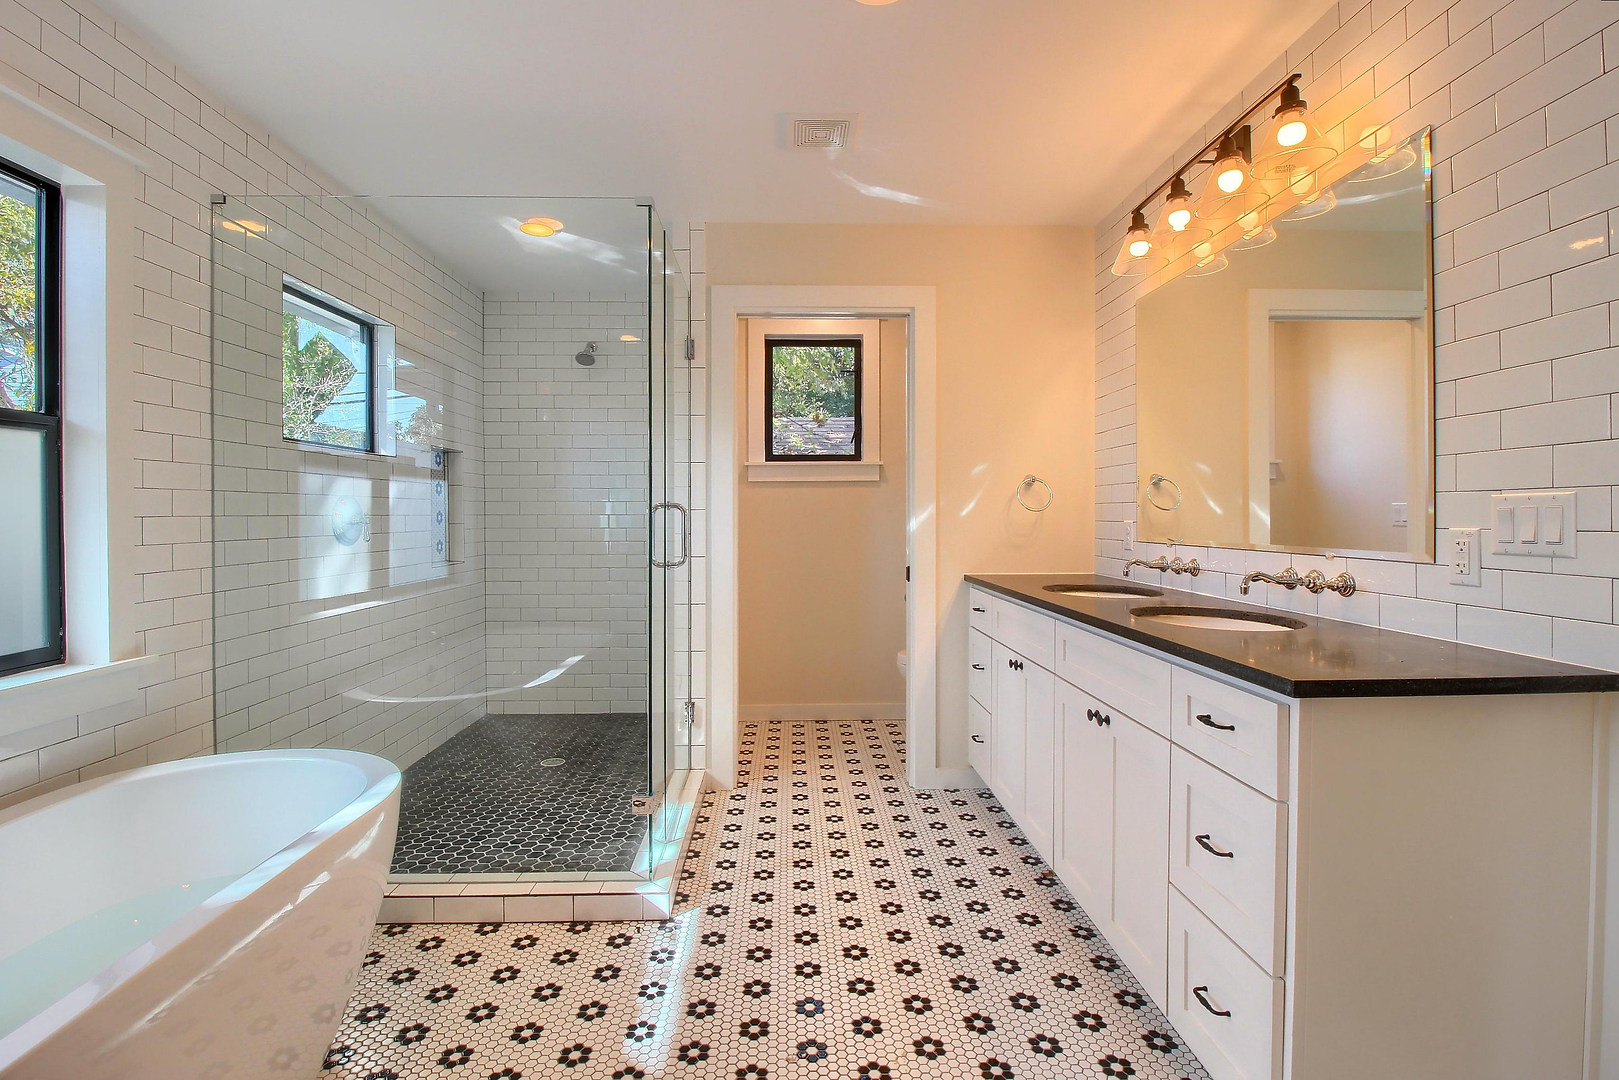 Home Renovation Full Master Bathroom on Bouldin in Austin, TX